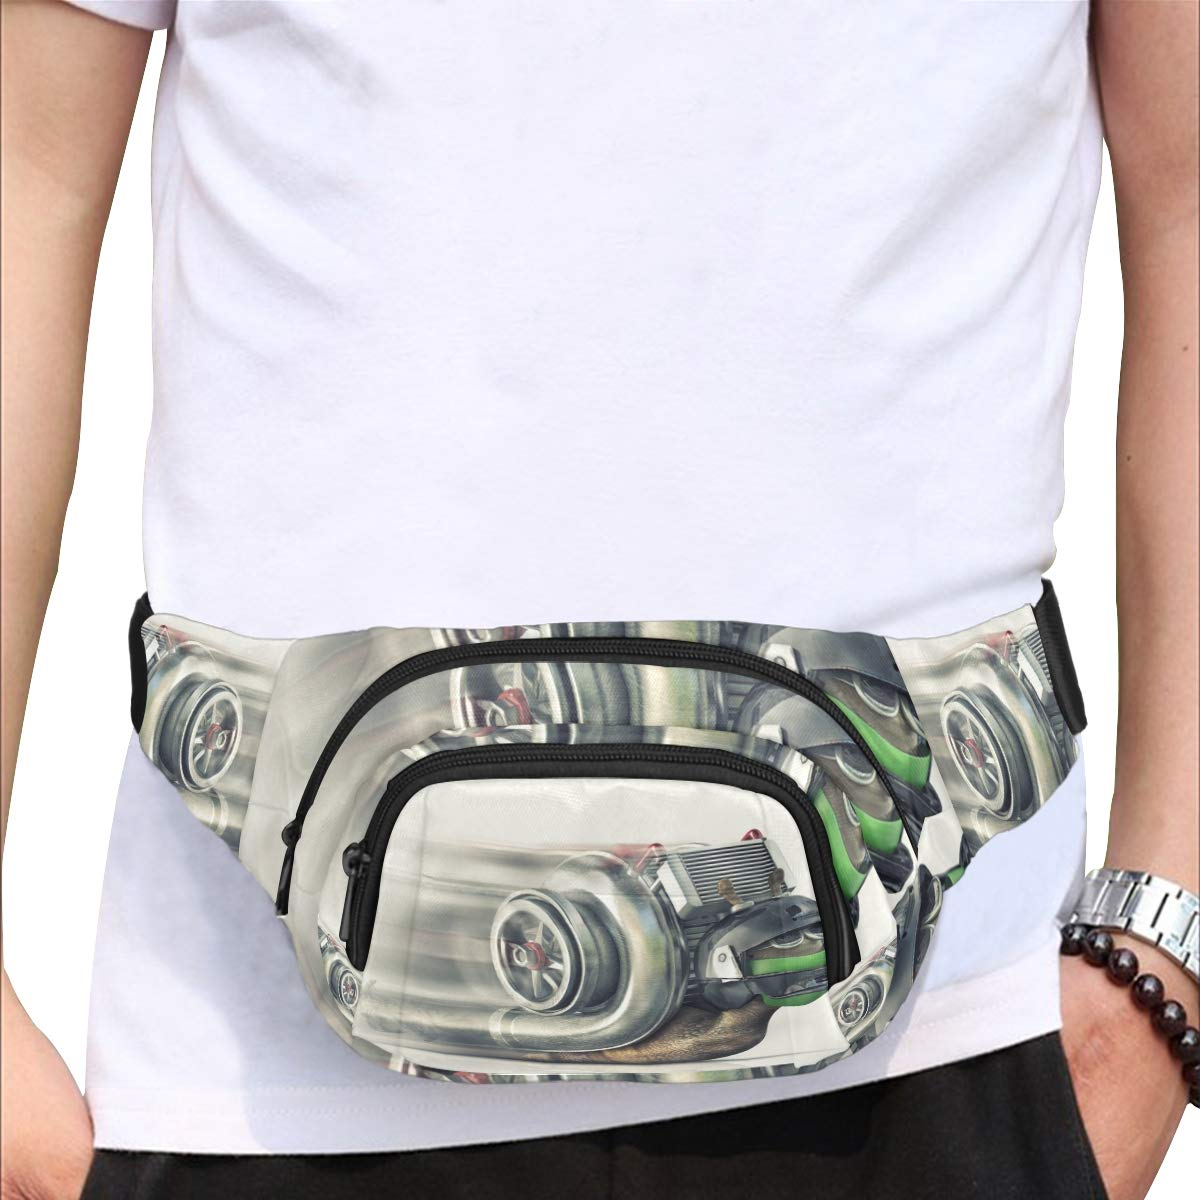 Curious Snails Crawl On Concrete Fenny Packs Waist Bags Adjustable Belt Waterproof Nylon Travel Running Sport Vacation Party For Men Women Boys Girls Kids